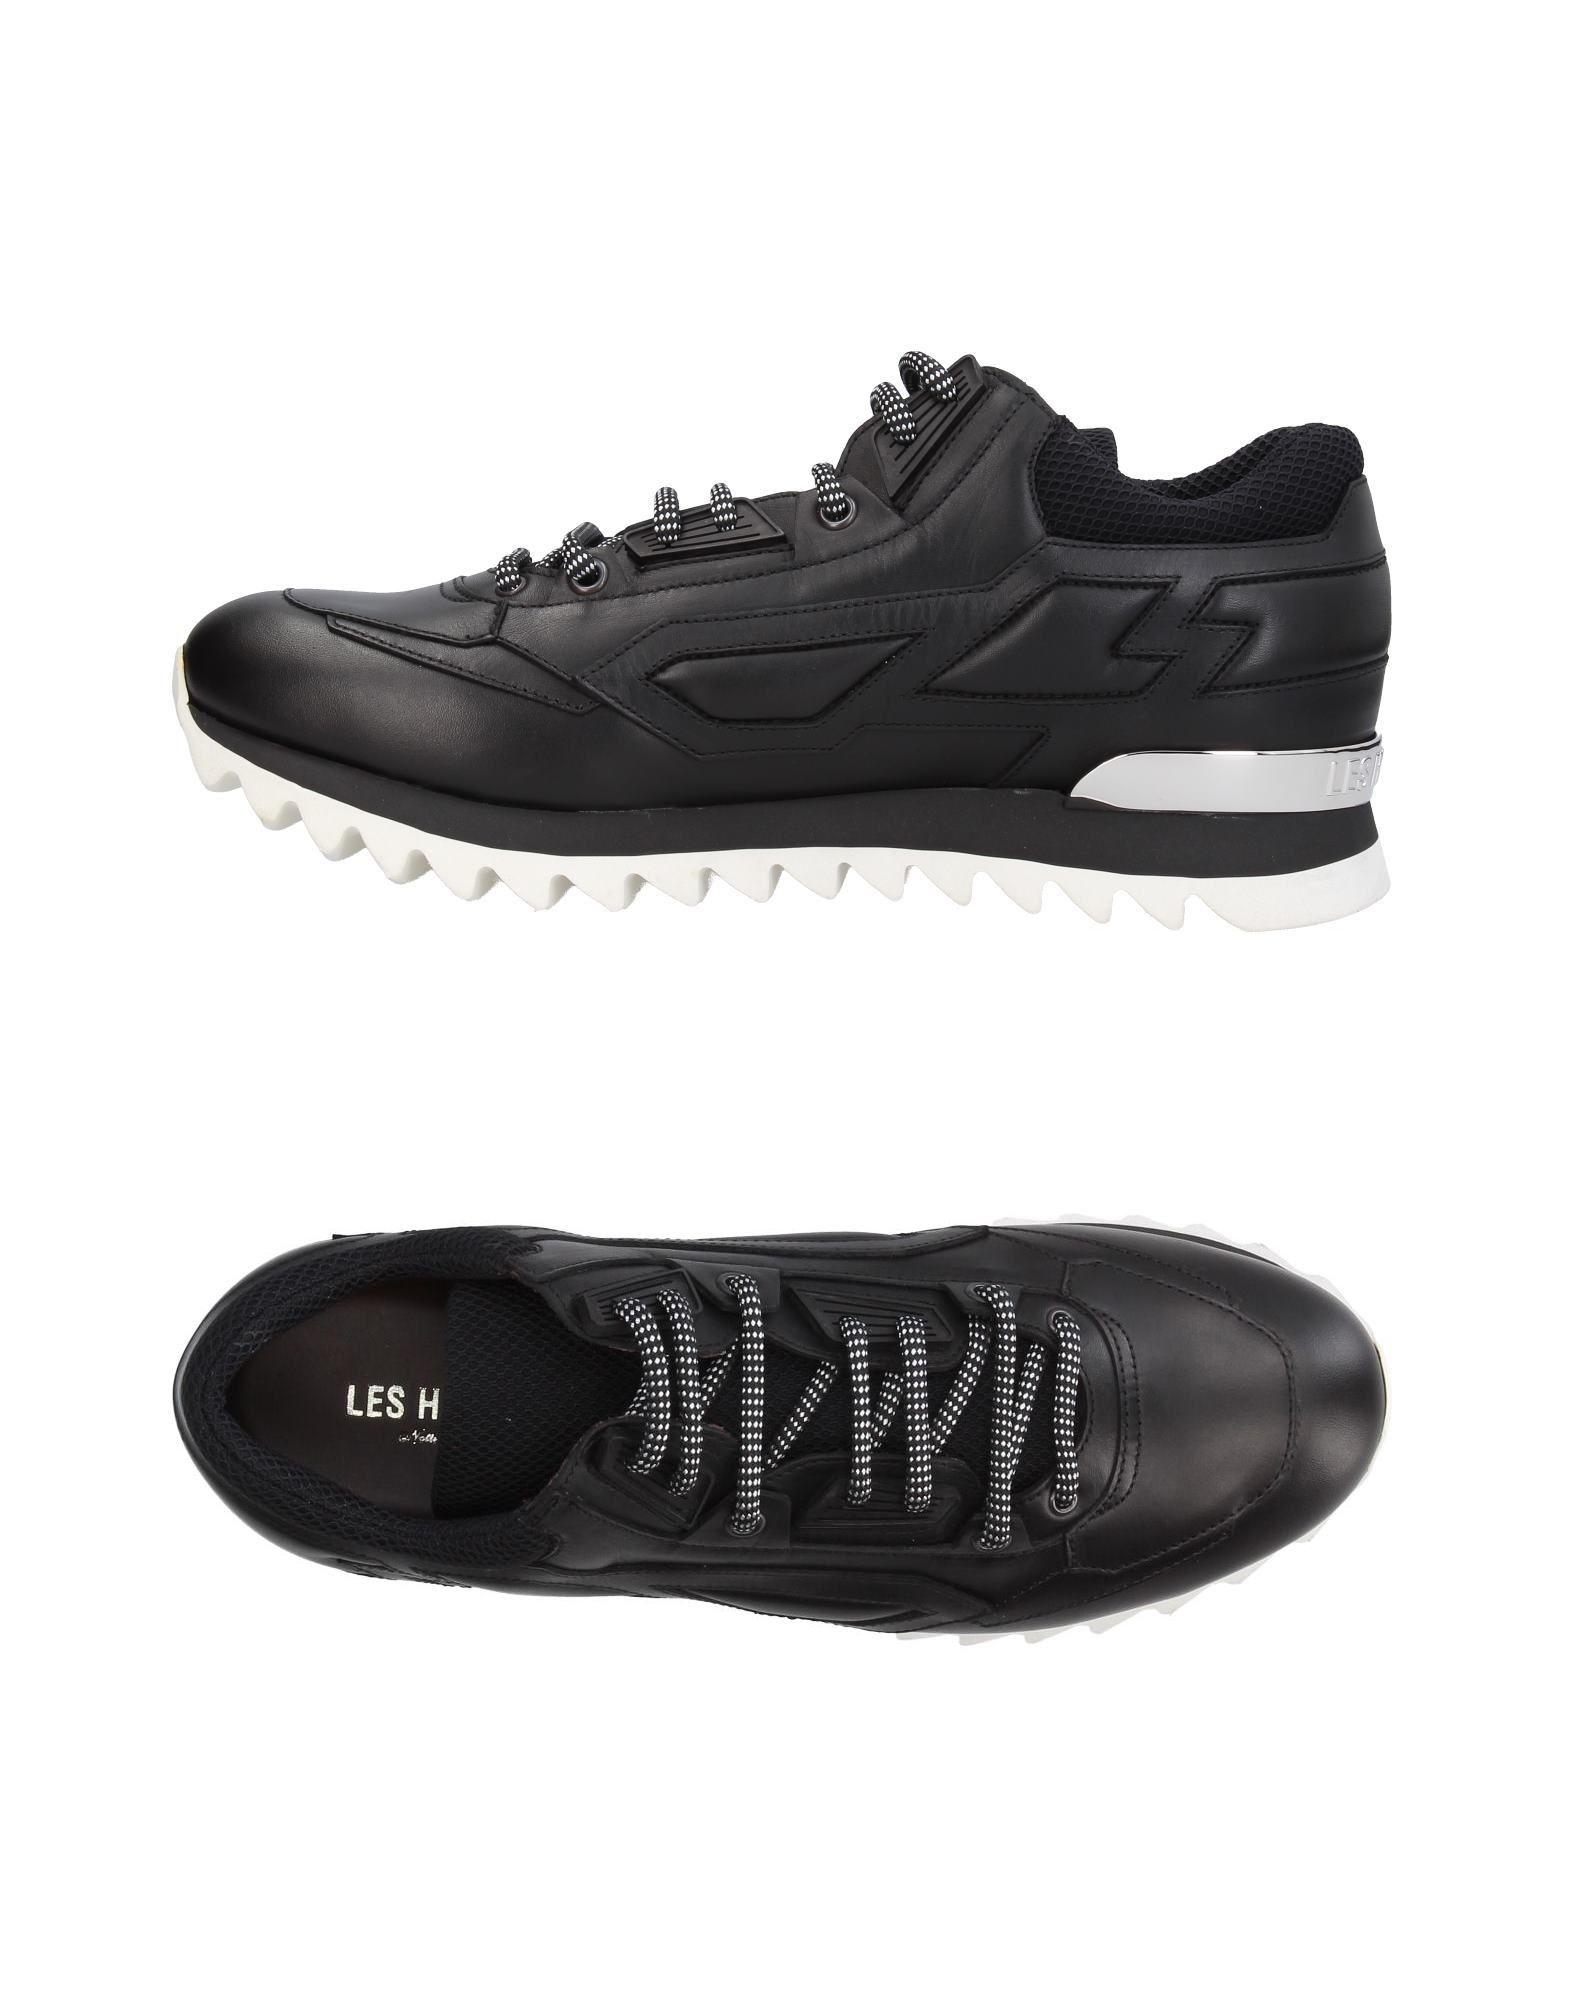 Les Hommes Sneakers Herren  11377369AE Gute Qualität beliebte Schuhe